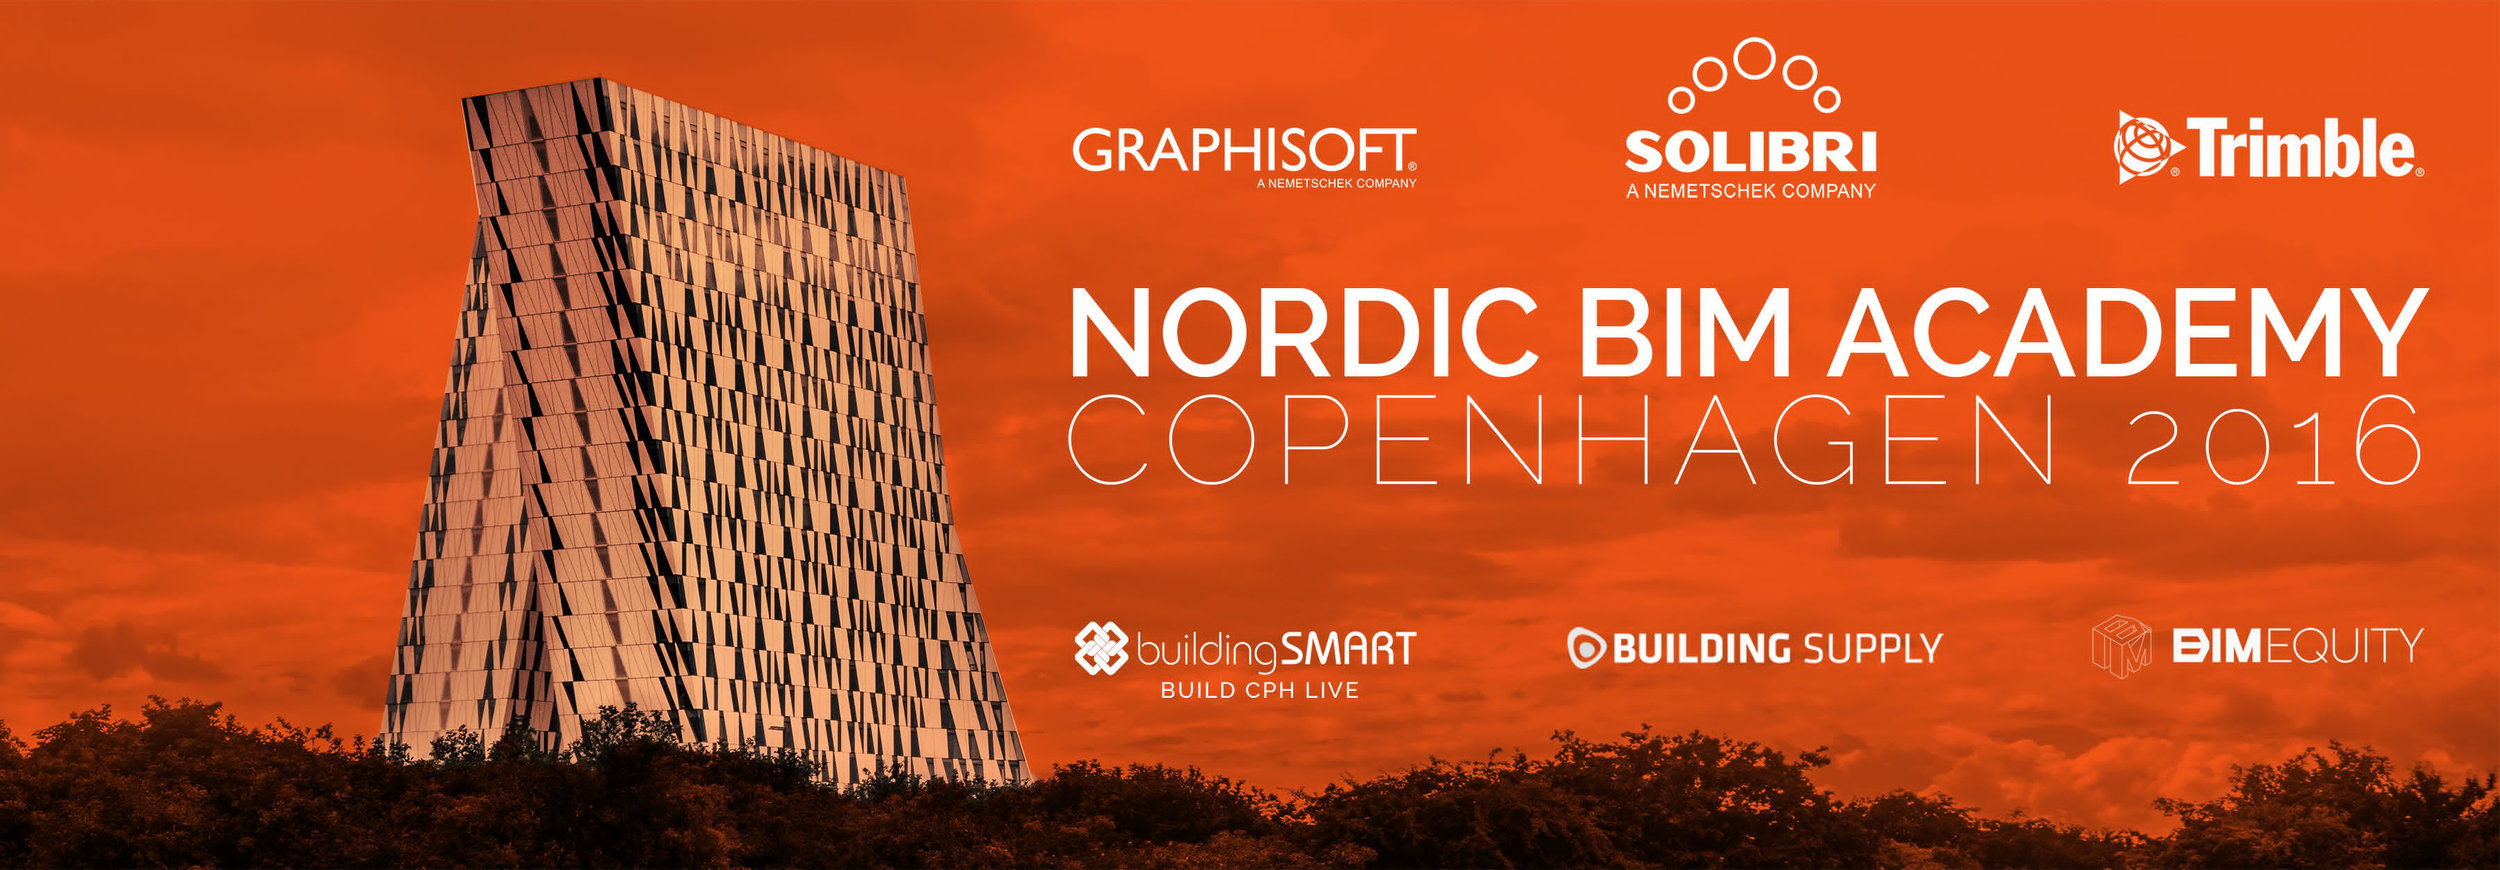 Nordic-BIM-Academy-01.jpg